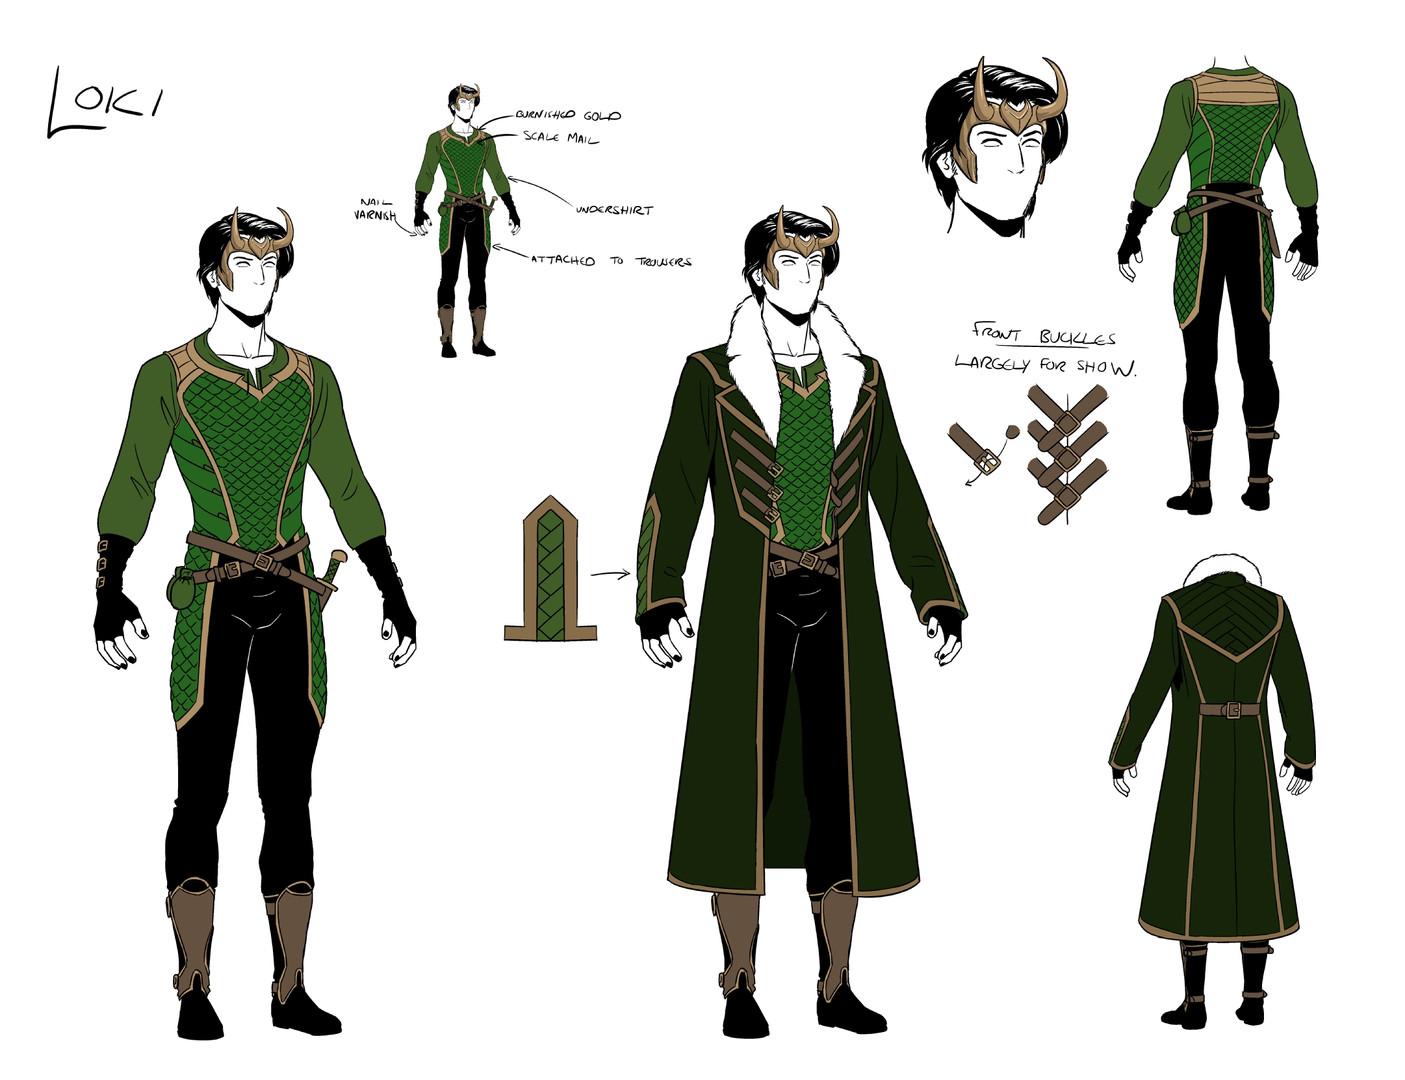 Loki Character Design sheet